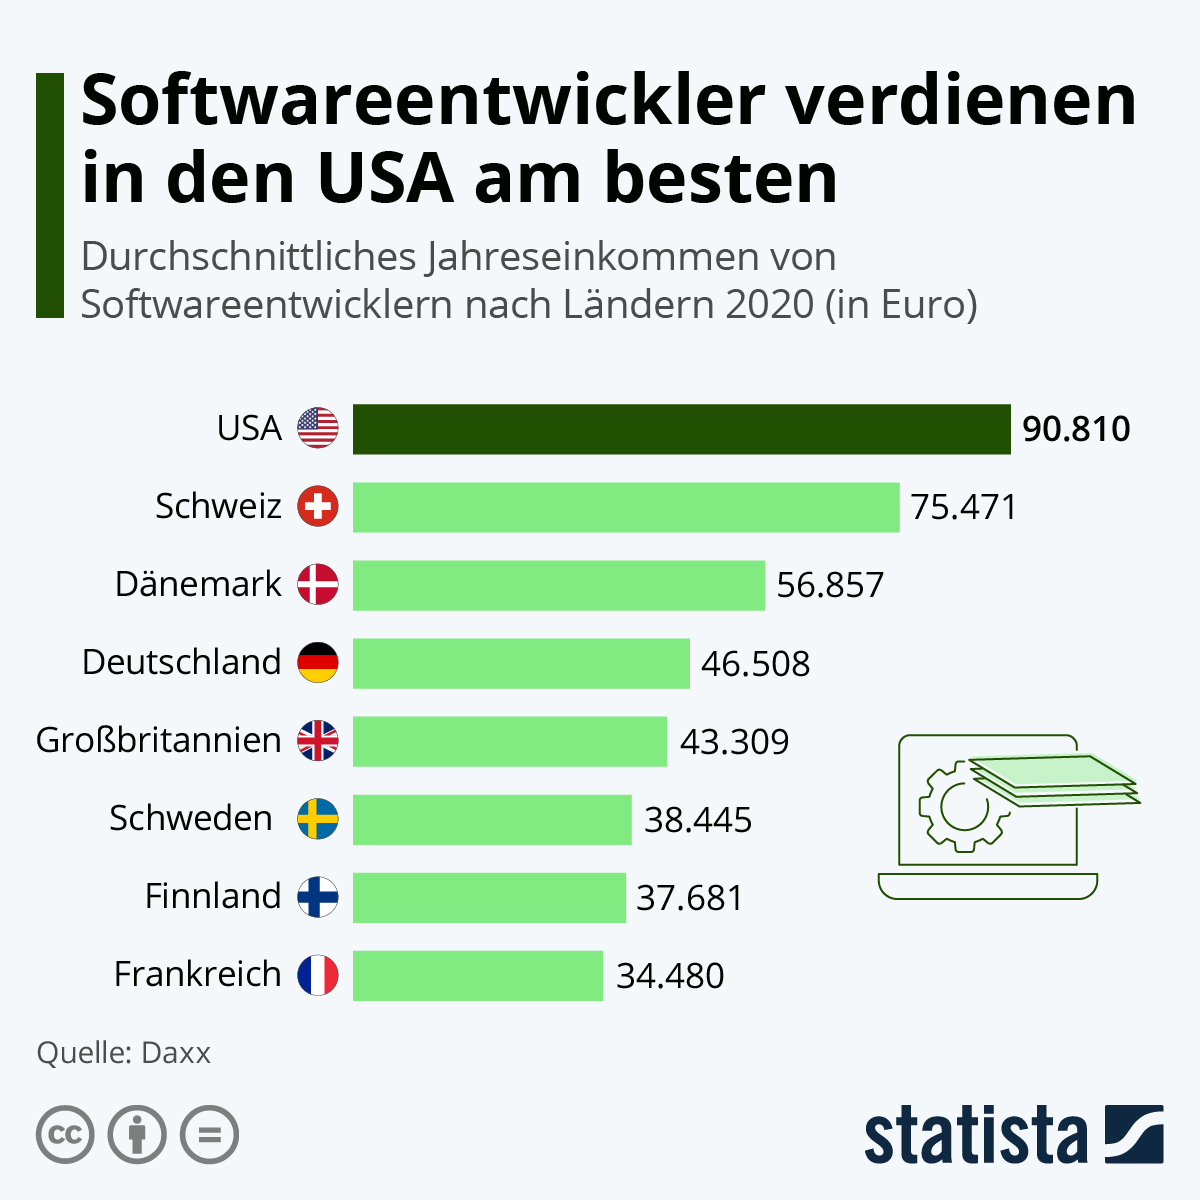 Infografik: Softwareentwickler verdienen in den USA am besten | Statista